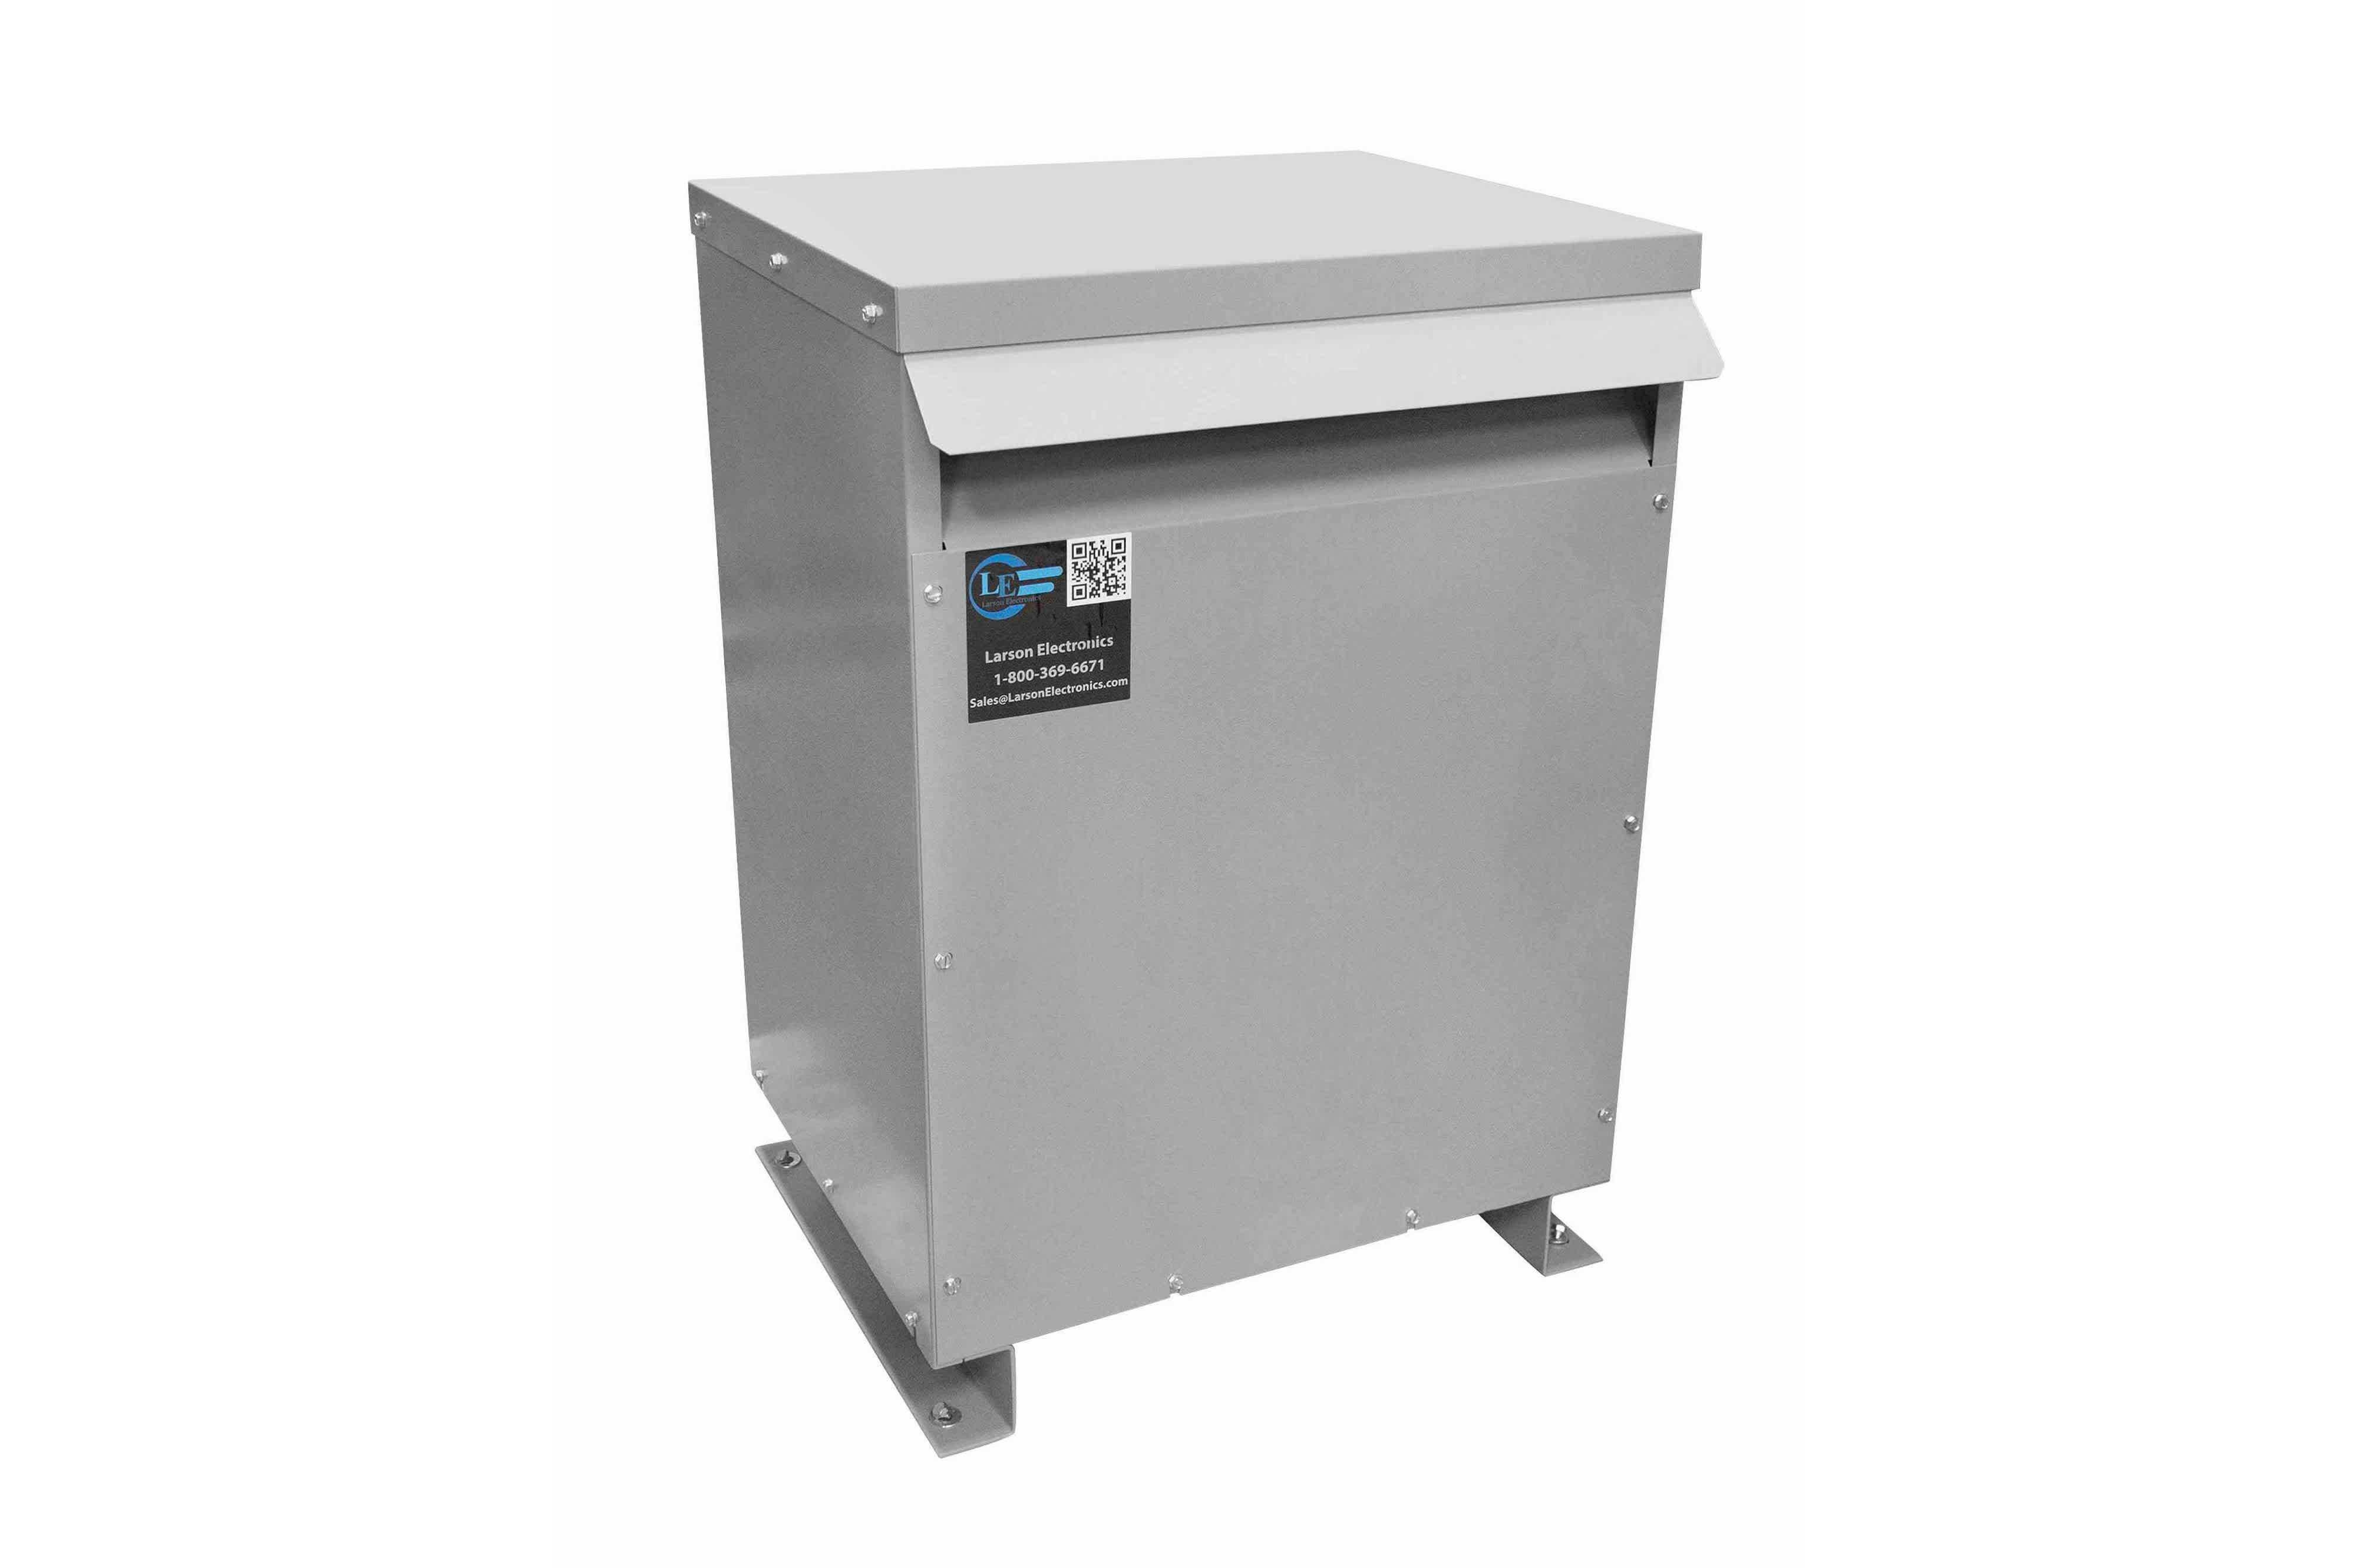 700 kVA 3PH Isolation Transformer, 460V Wye Primary, 400V Delta Secondary, N3R, Ventilated, 60 Hz